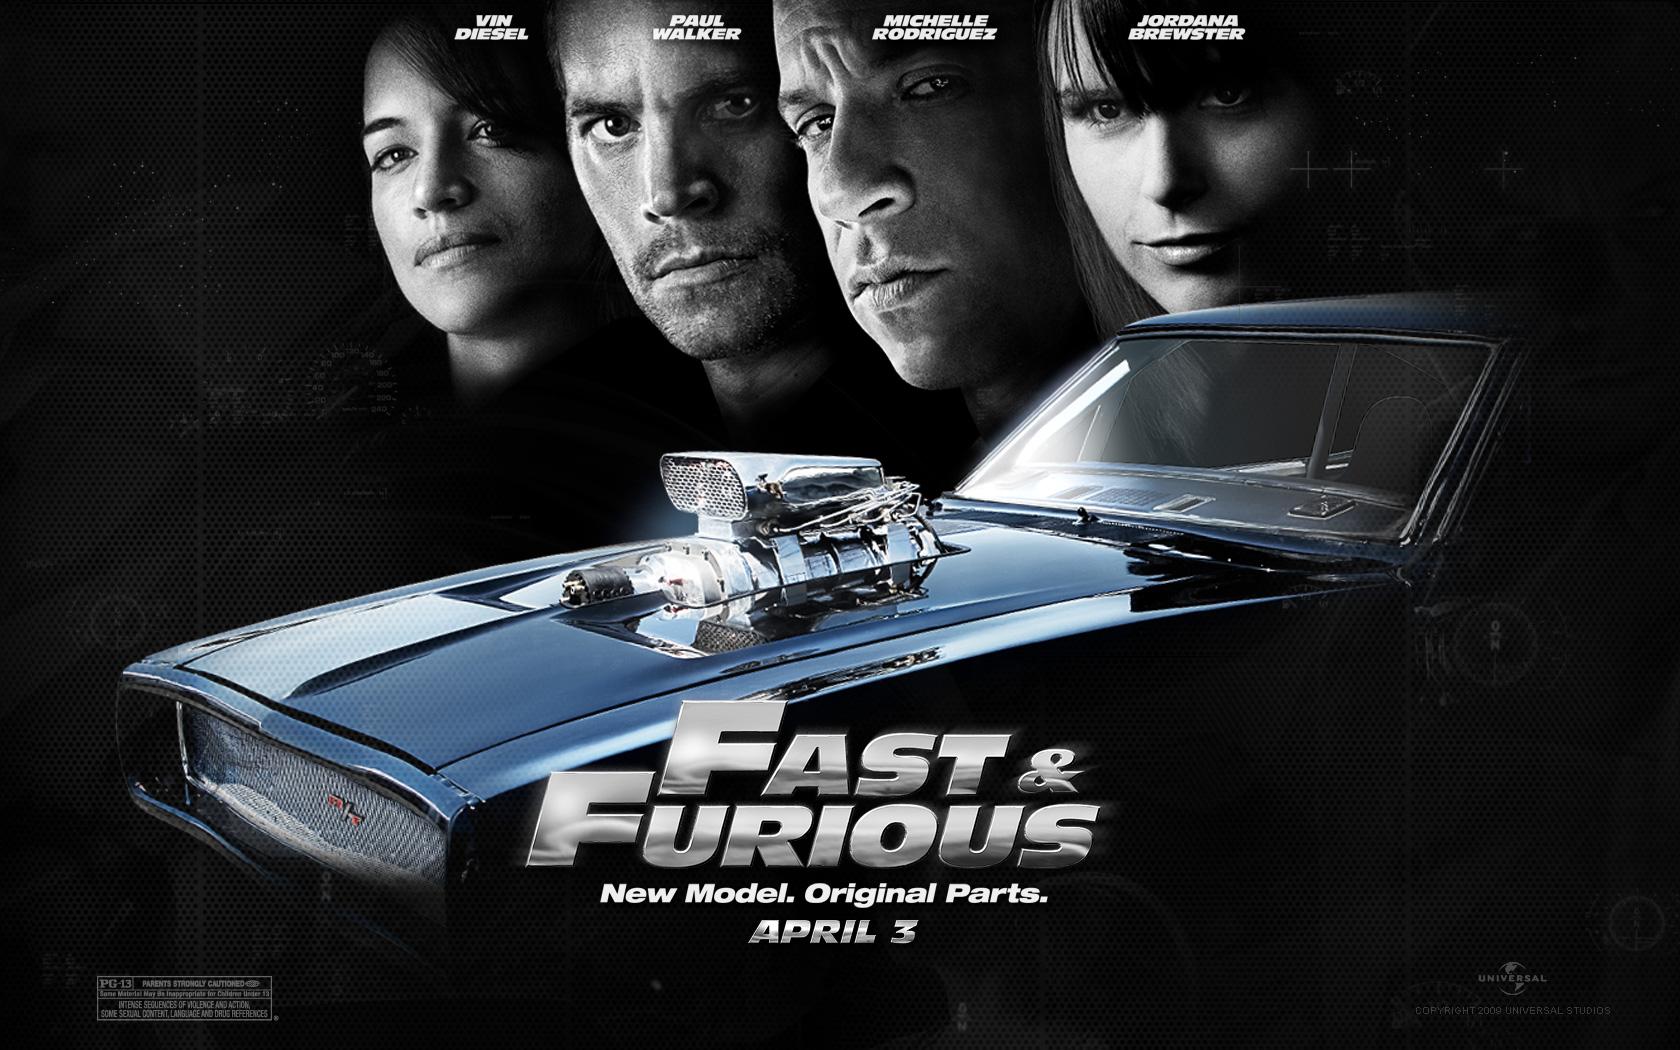 Fonds d'écran Cinéma Fast and Furious 4